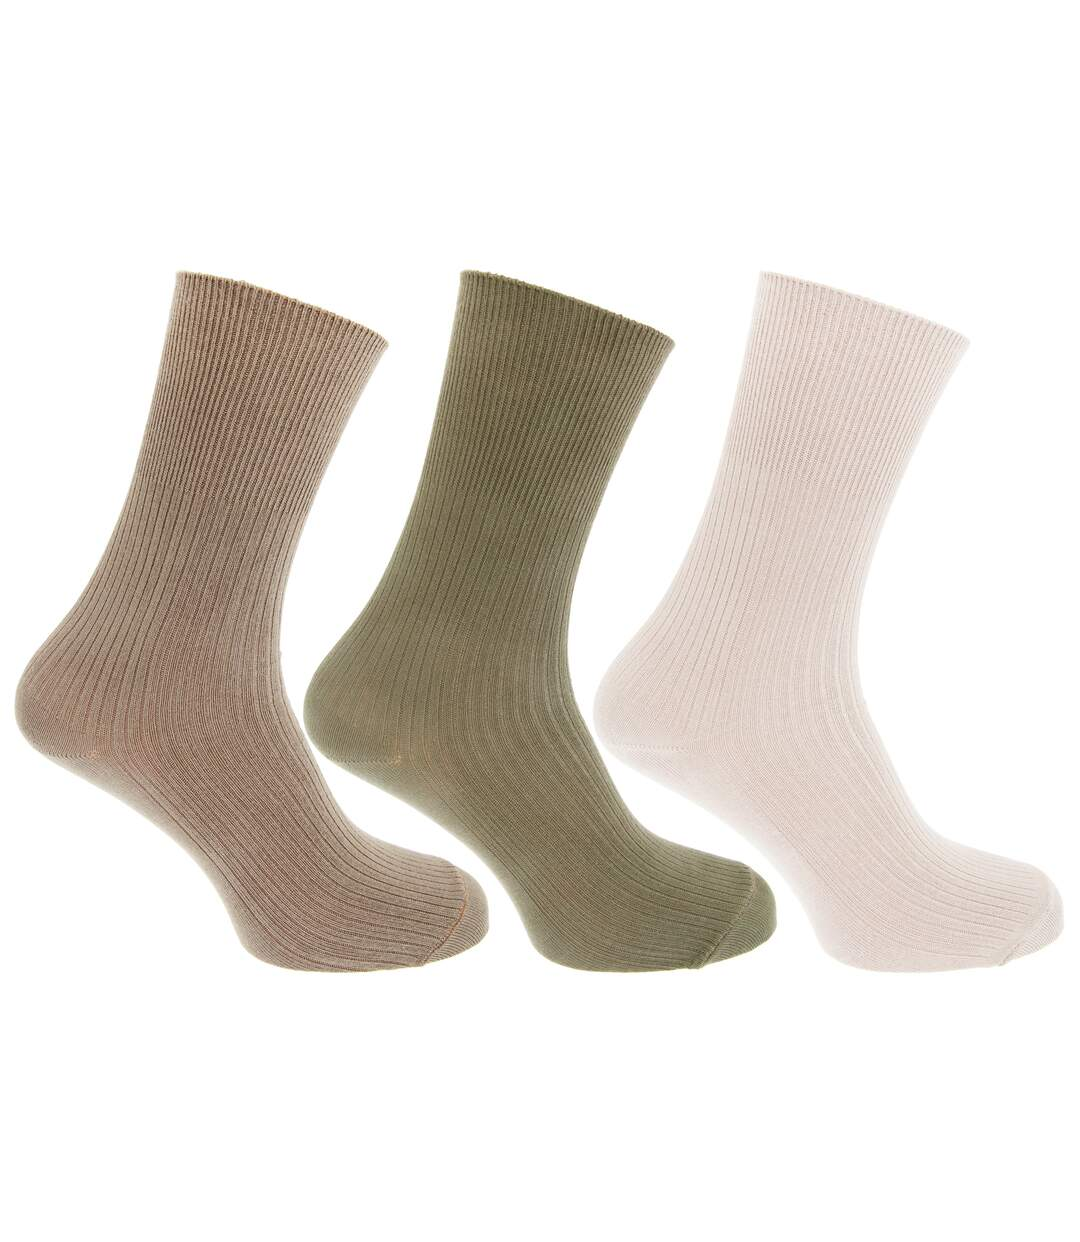 Mens Casual Non Elastic Bamboo Viscose Socks (Pack Of 3) (Green/Beige/Cream) - UTMB376